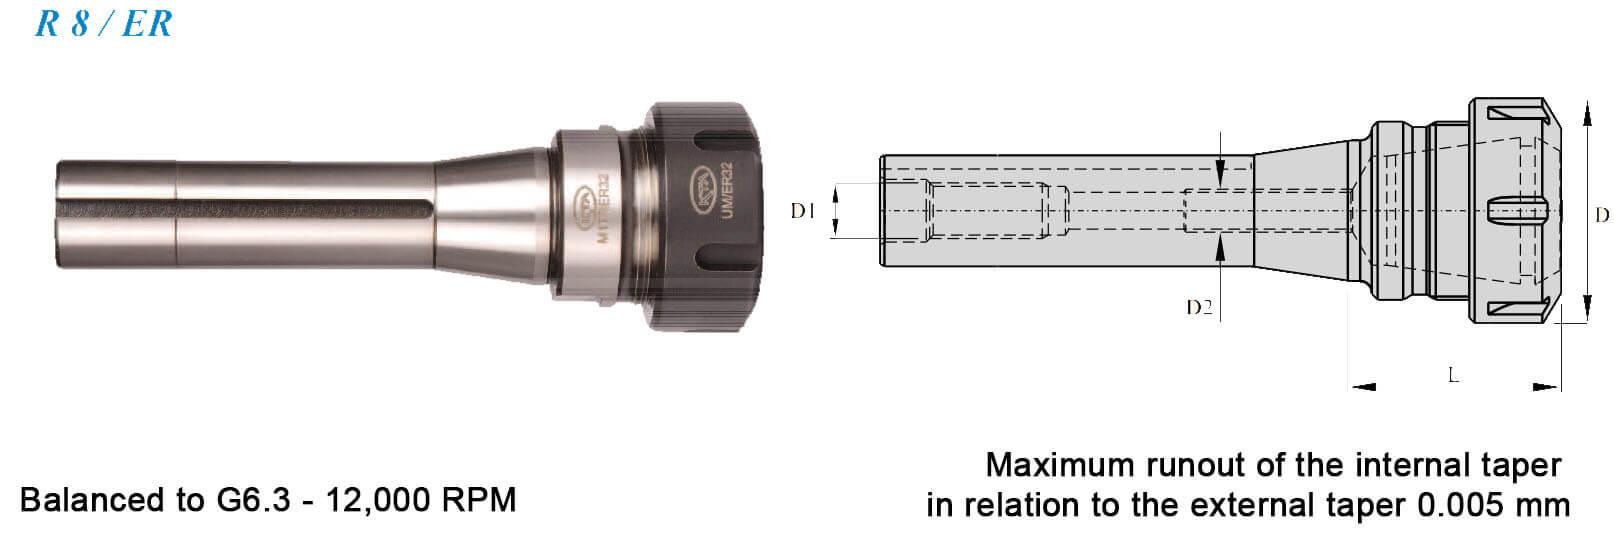 R8 Shank Tool Holders